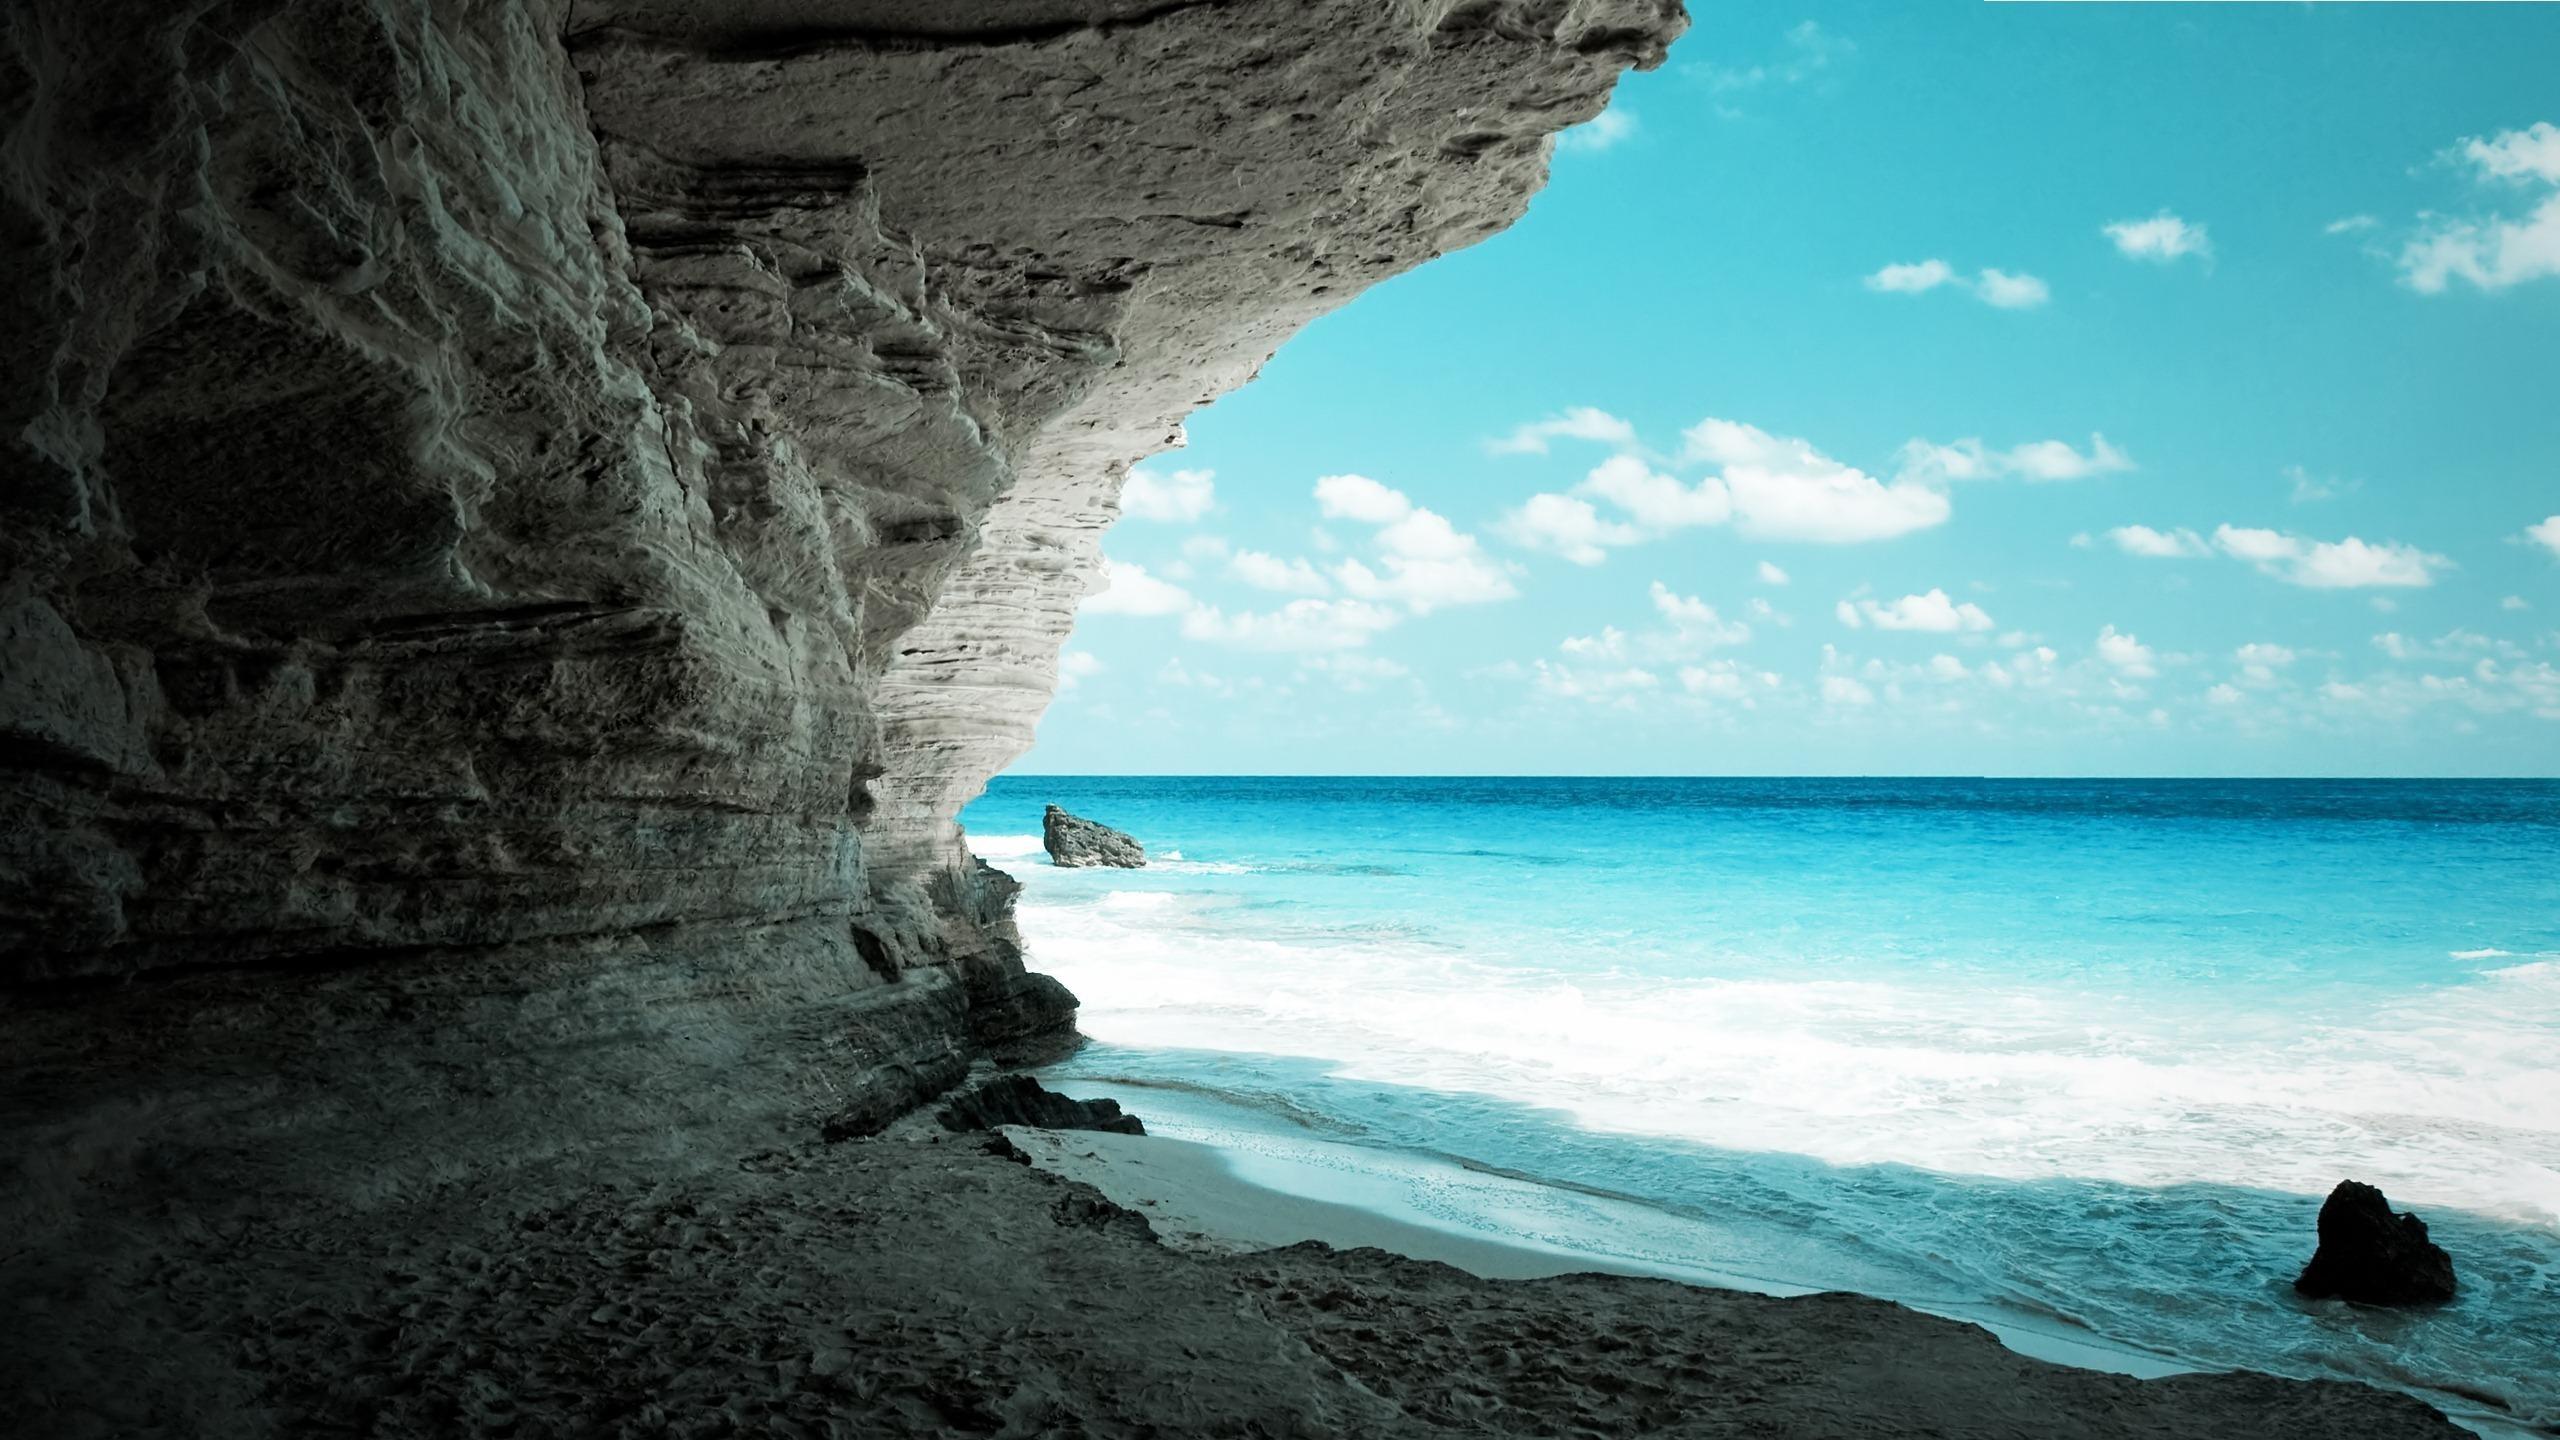 … amazing beach hd desktop best backgrounds wallpaper desktop images …